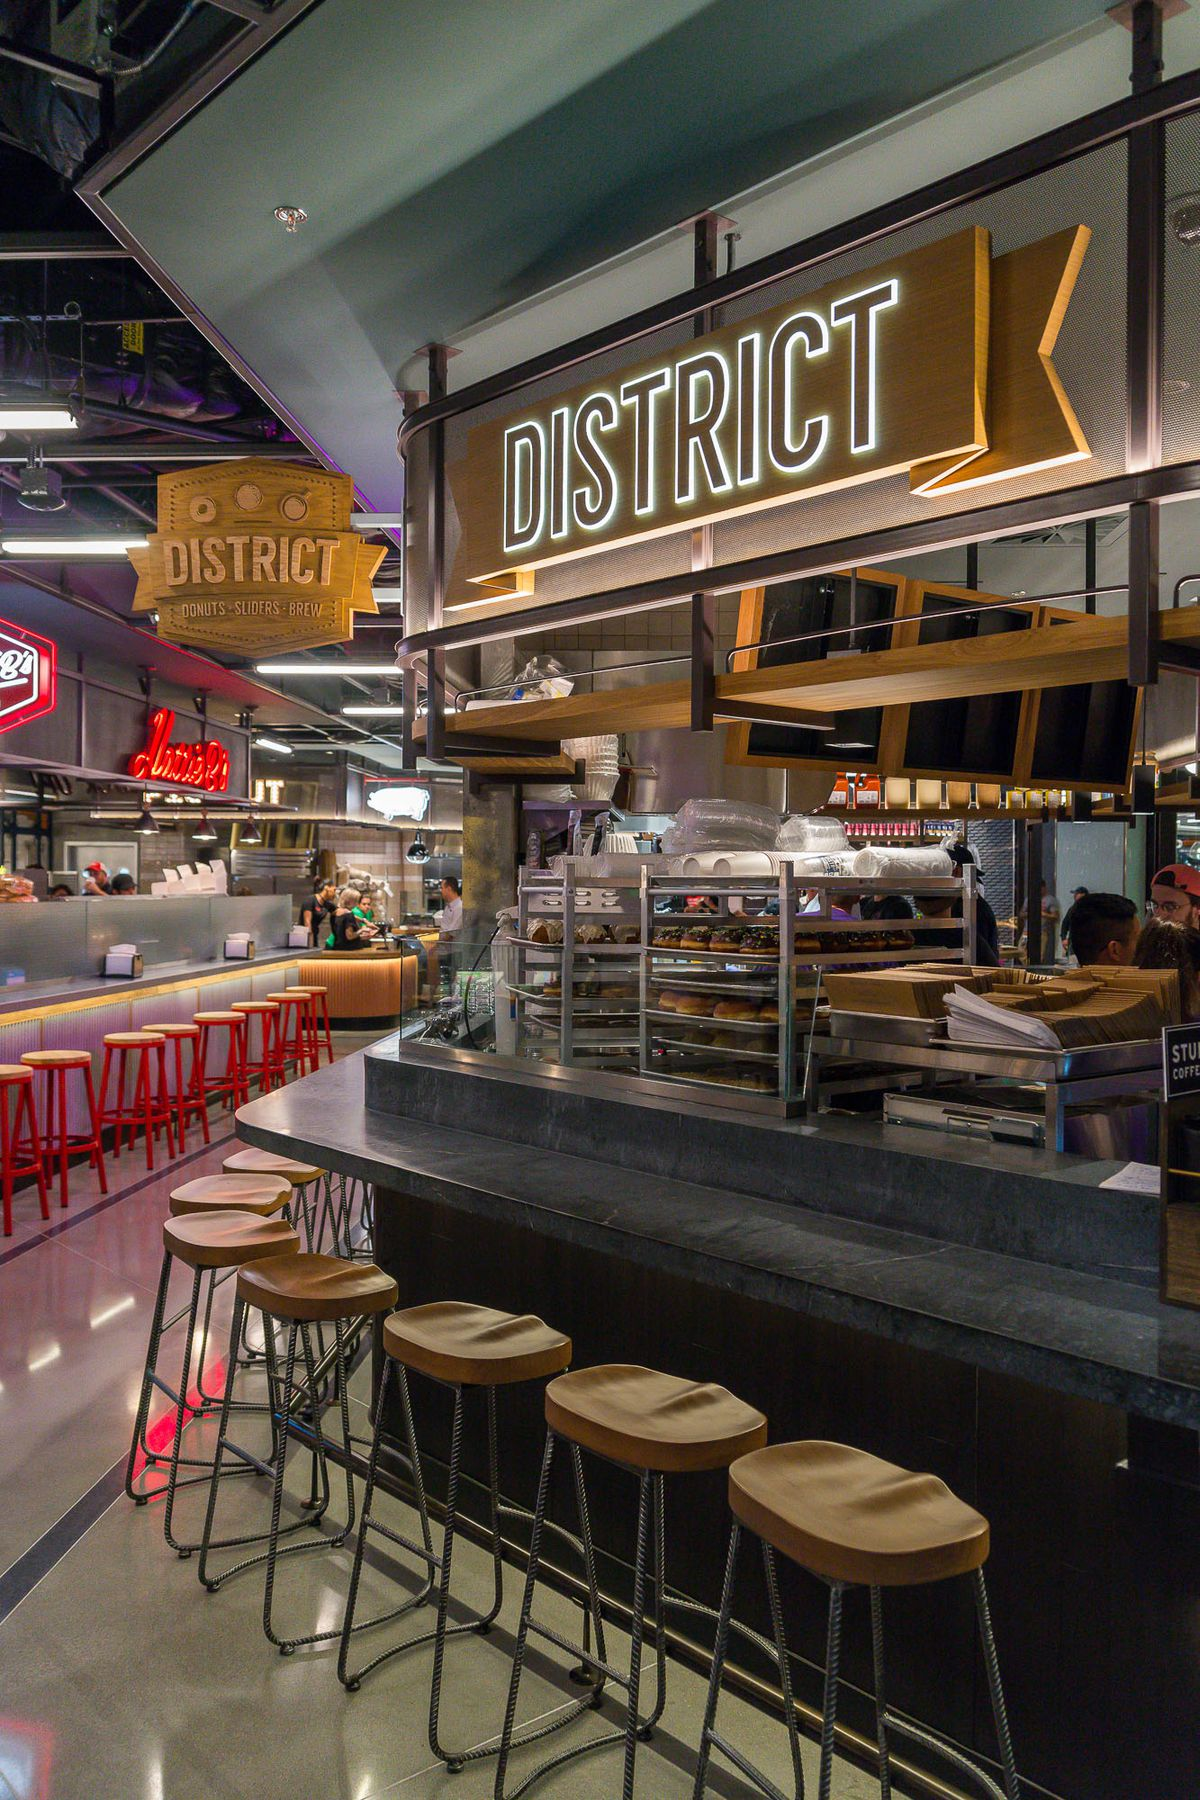 District: Donuts. Sliders. Brew and Hattie B's at Block 16 Urban Food Hall